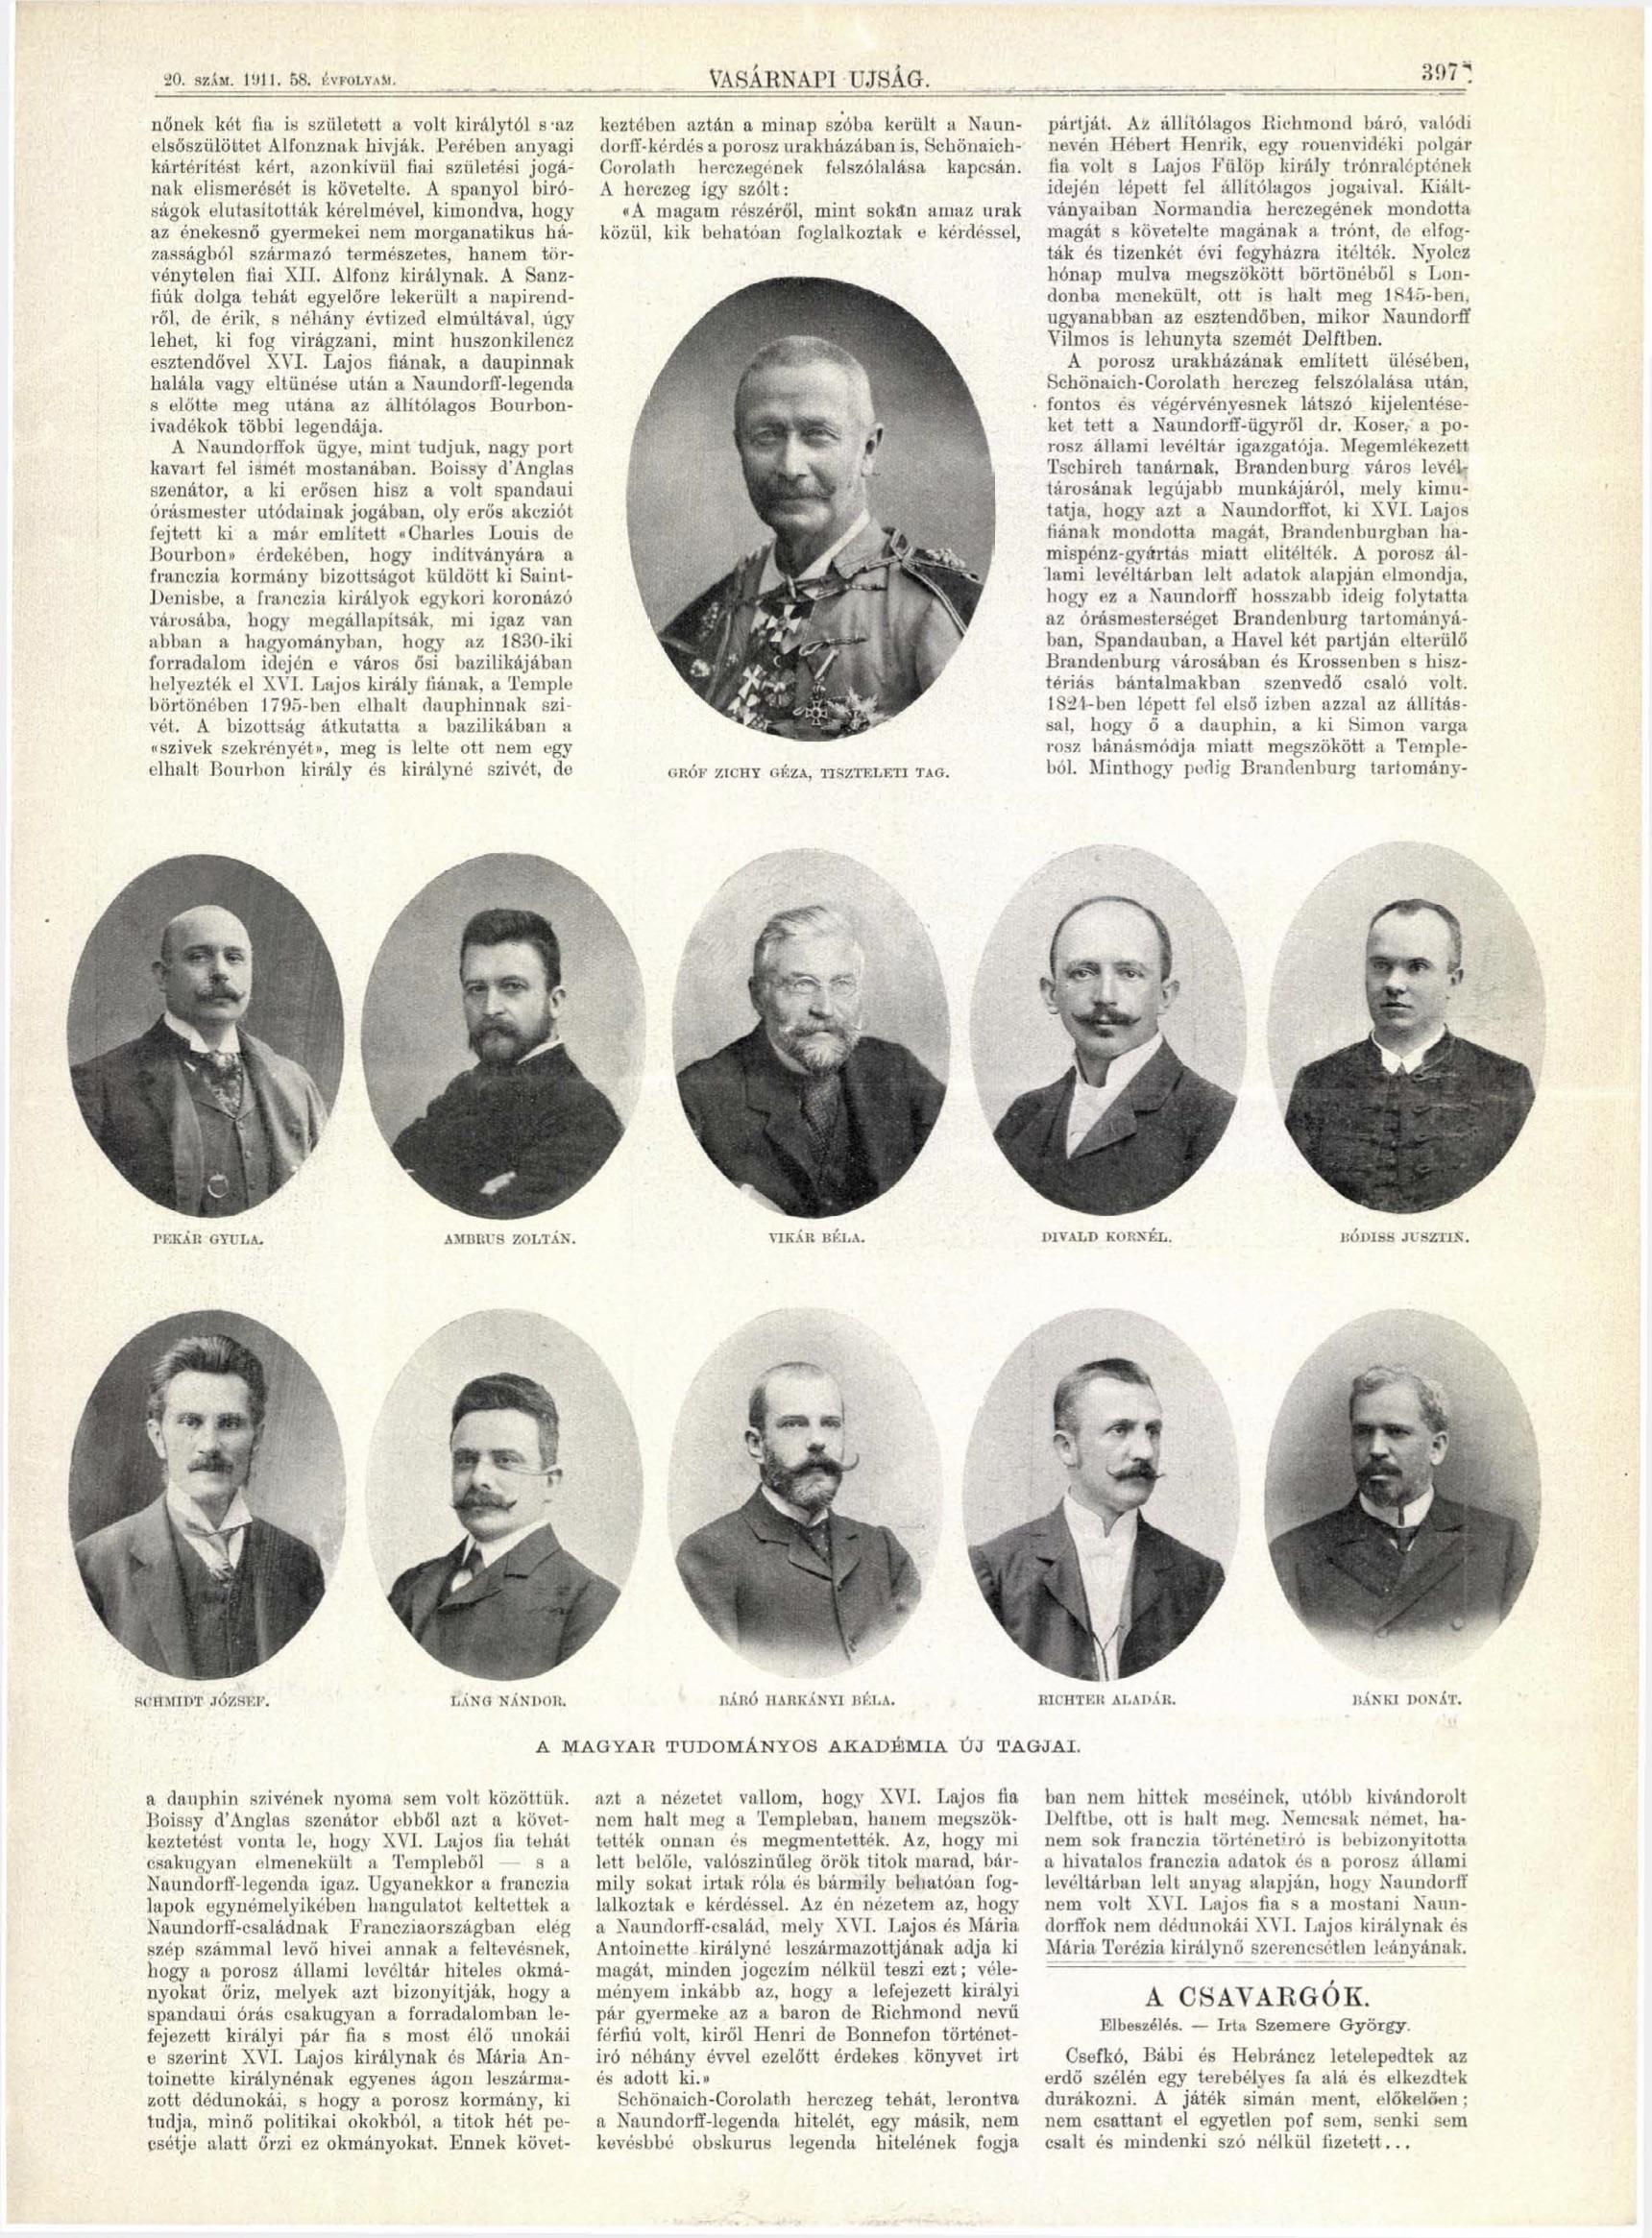 vasarnapiujsag_1911_schmidt_indologus_pages405-405.jpg